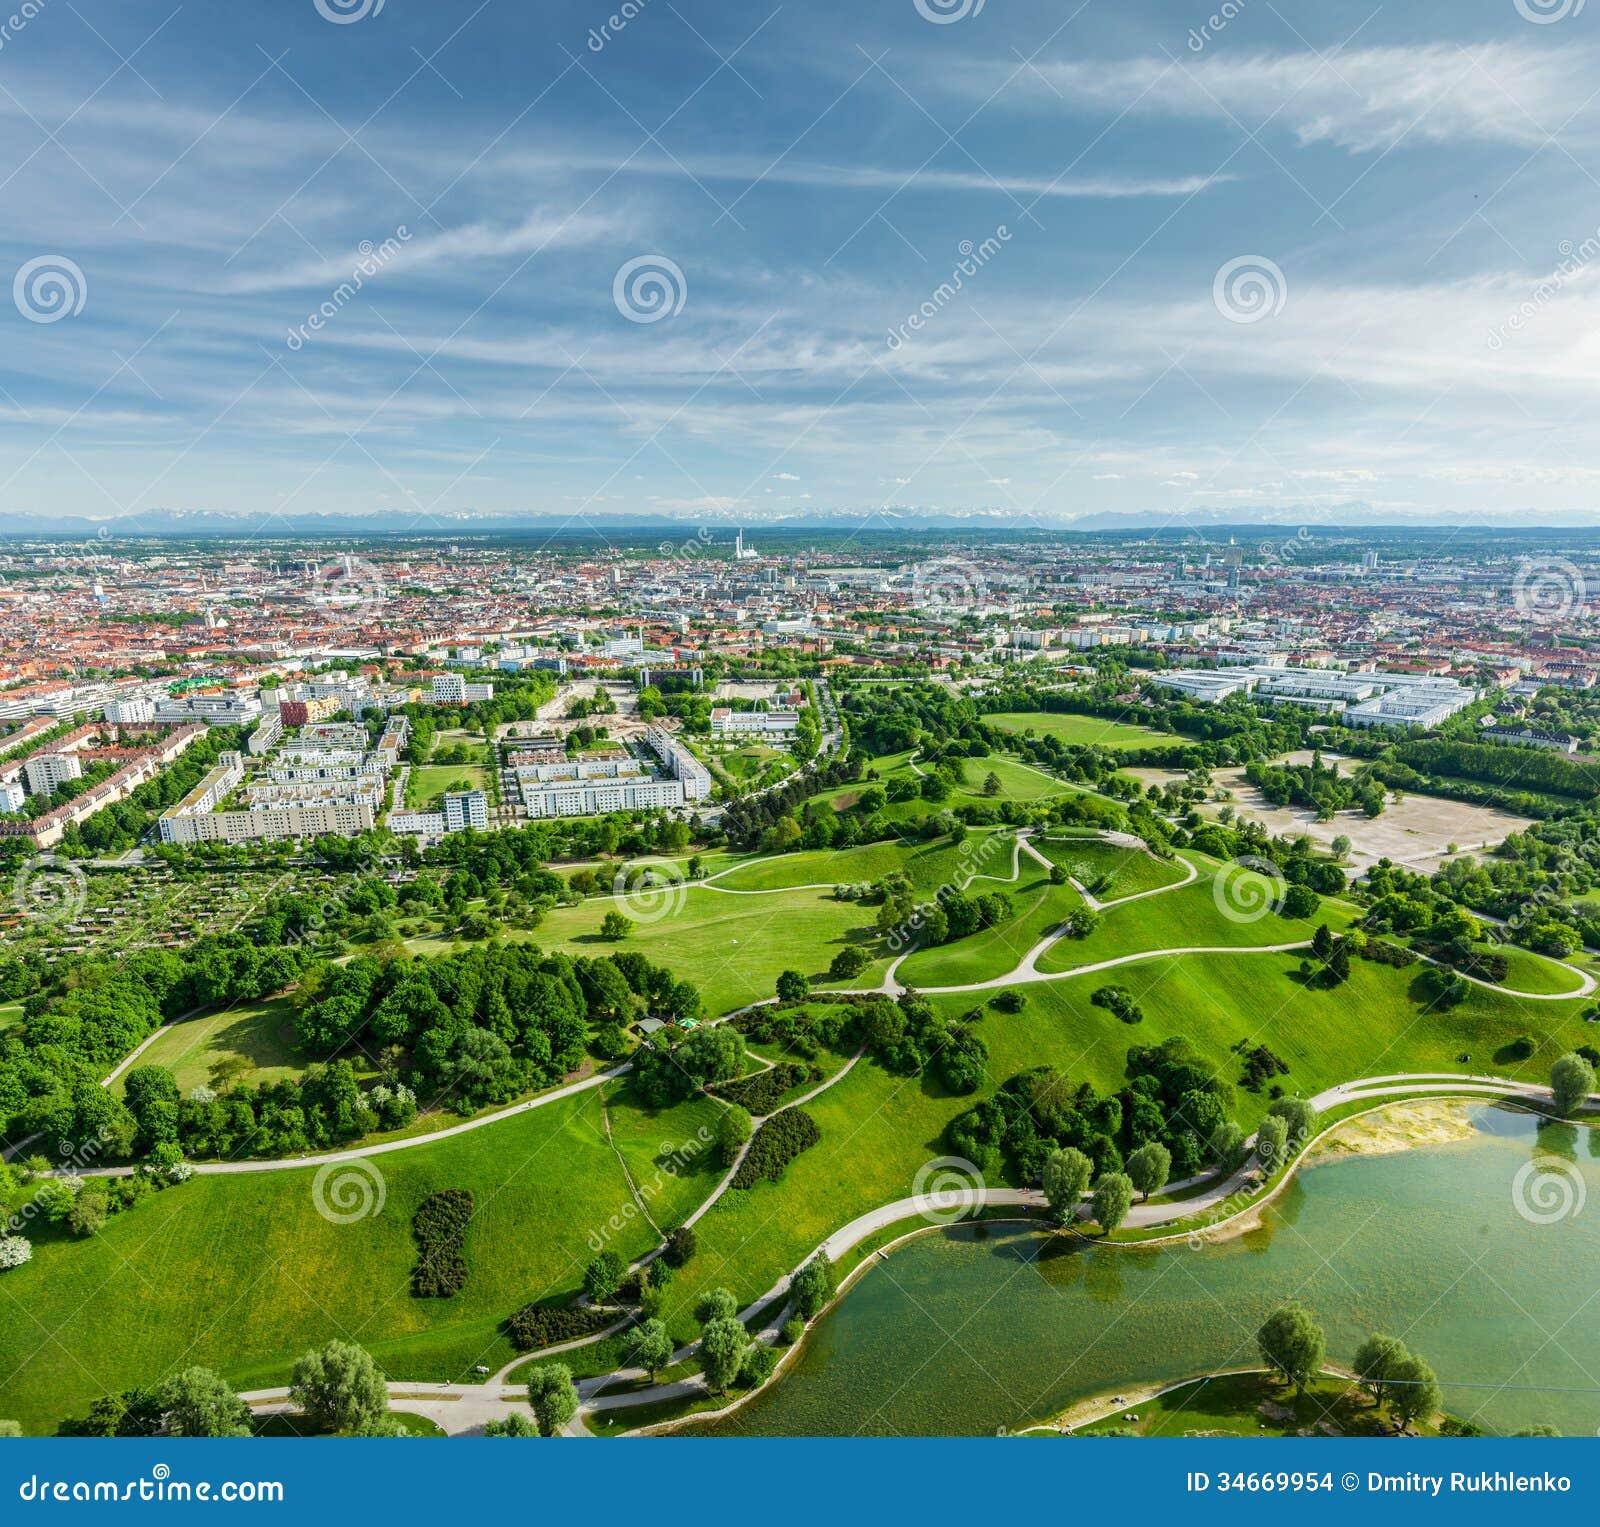 Aerial View Of Olympiapark Munich Bavaria Germany